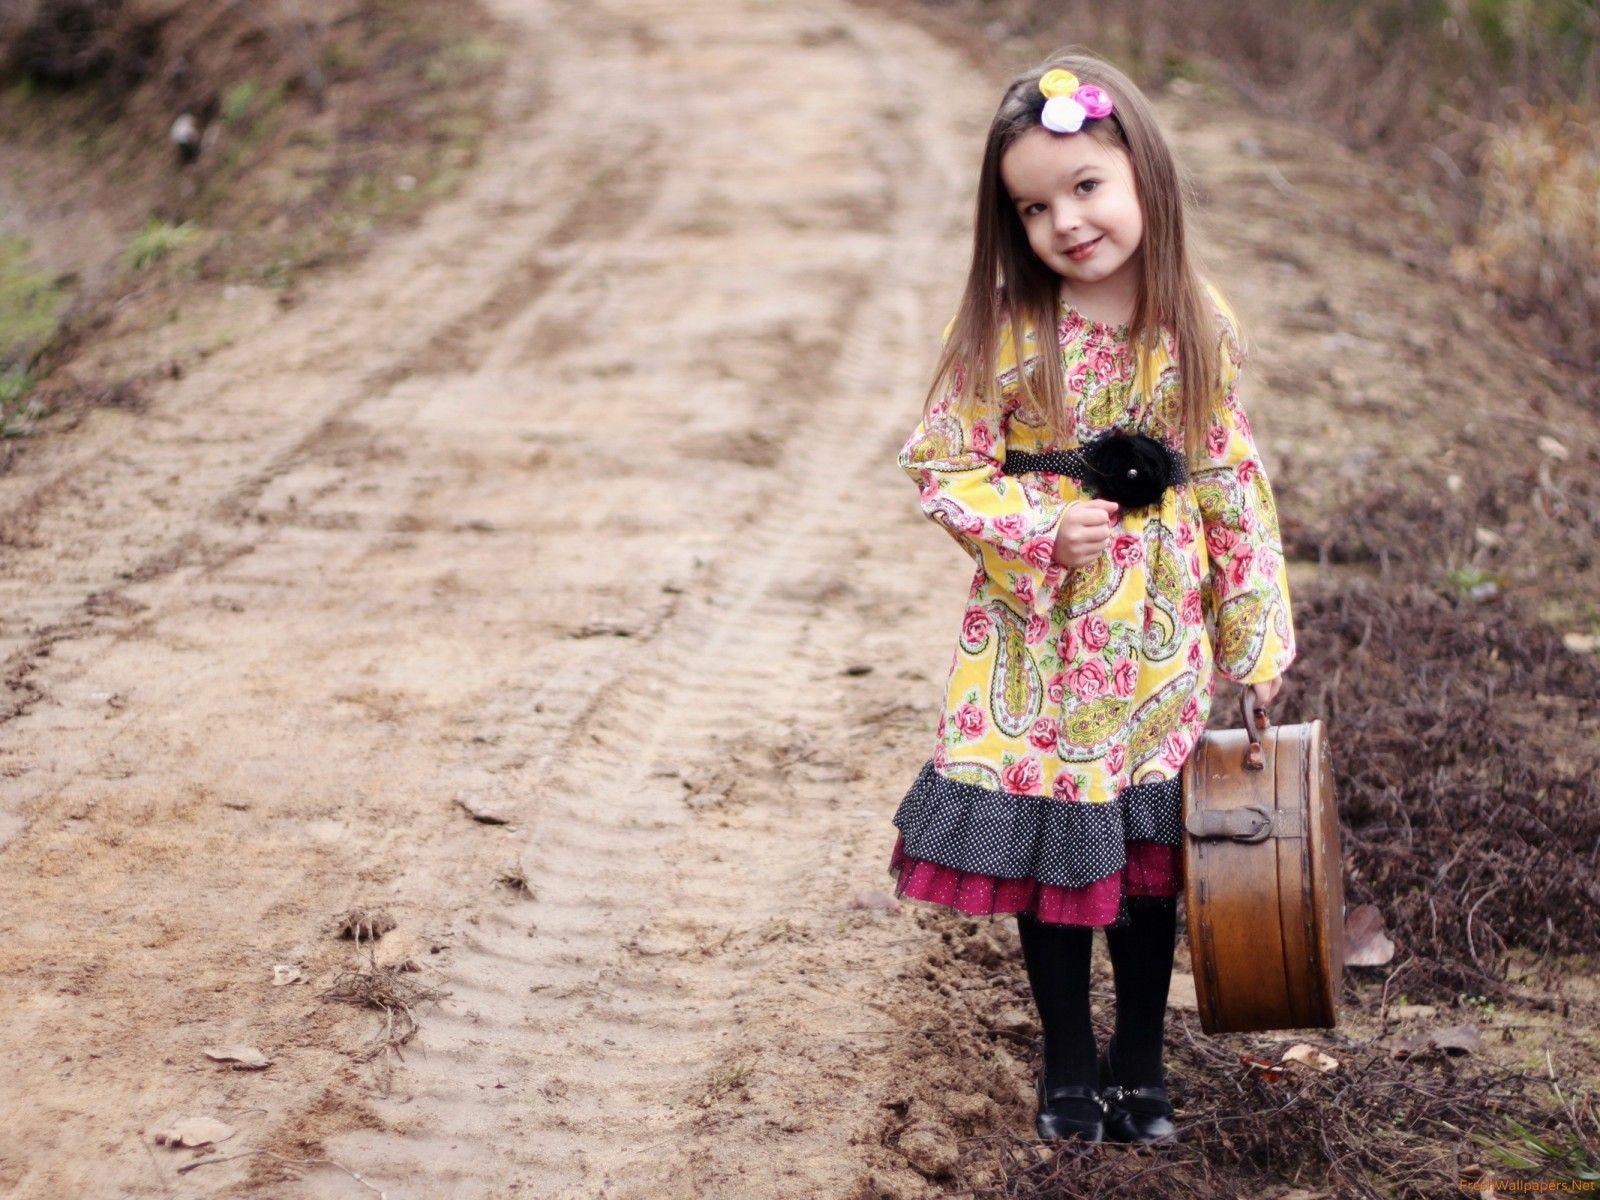 Wallpaper download cute girl - Cute Girl Wallpapers Hd